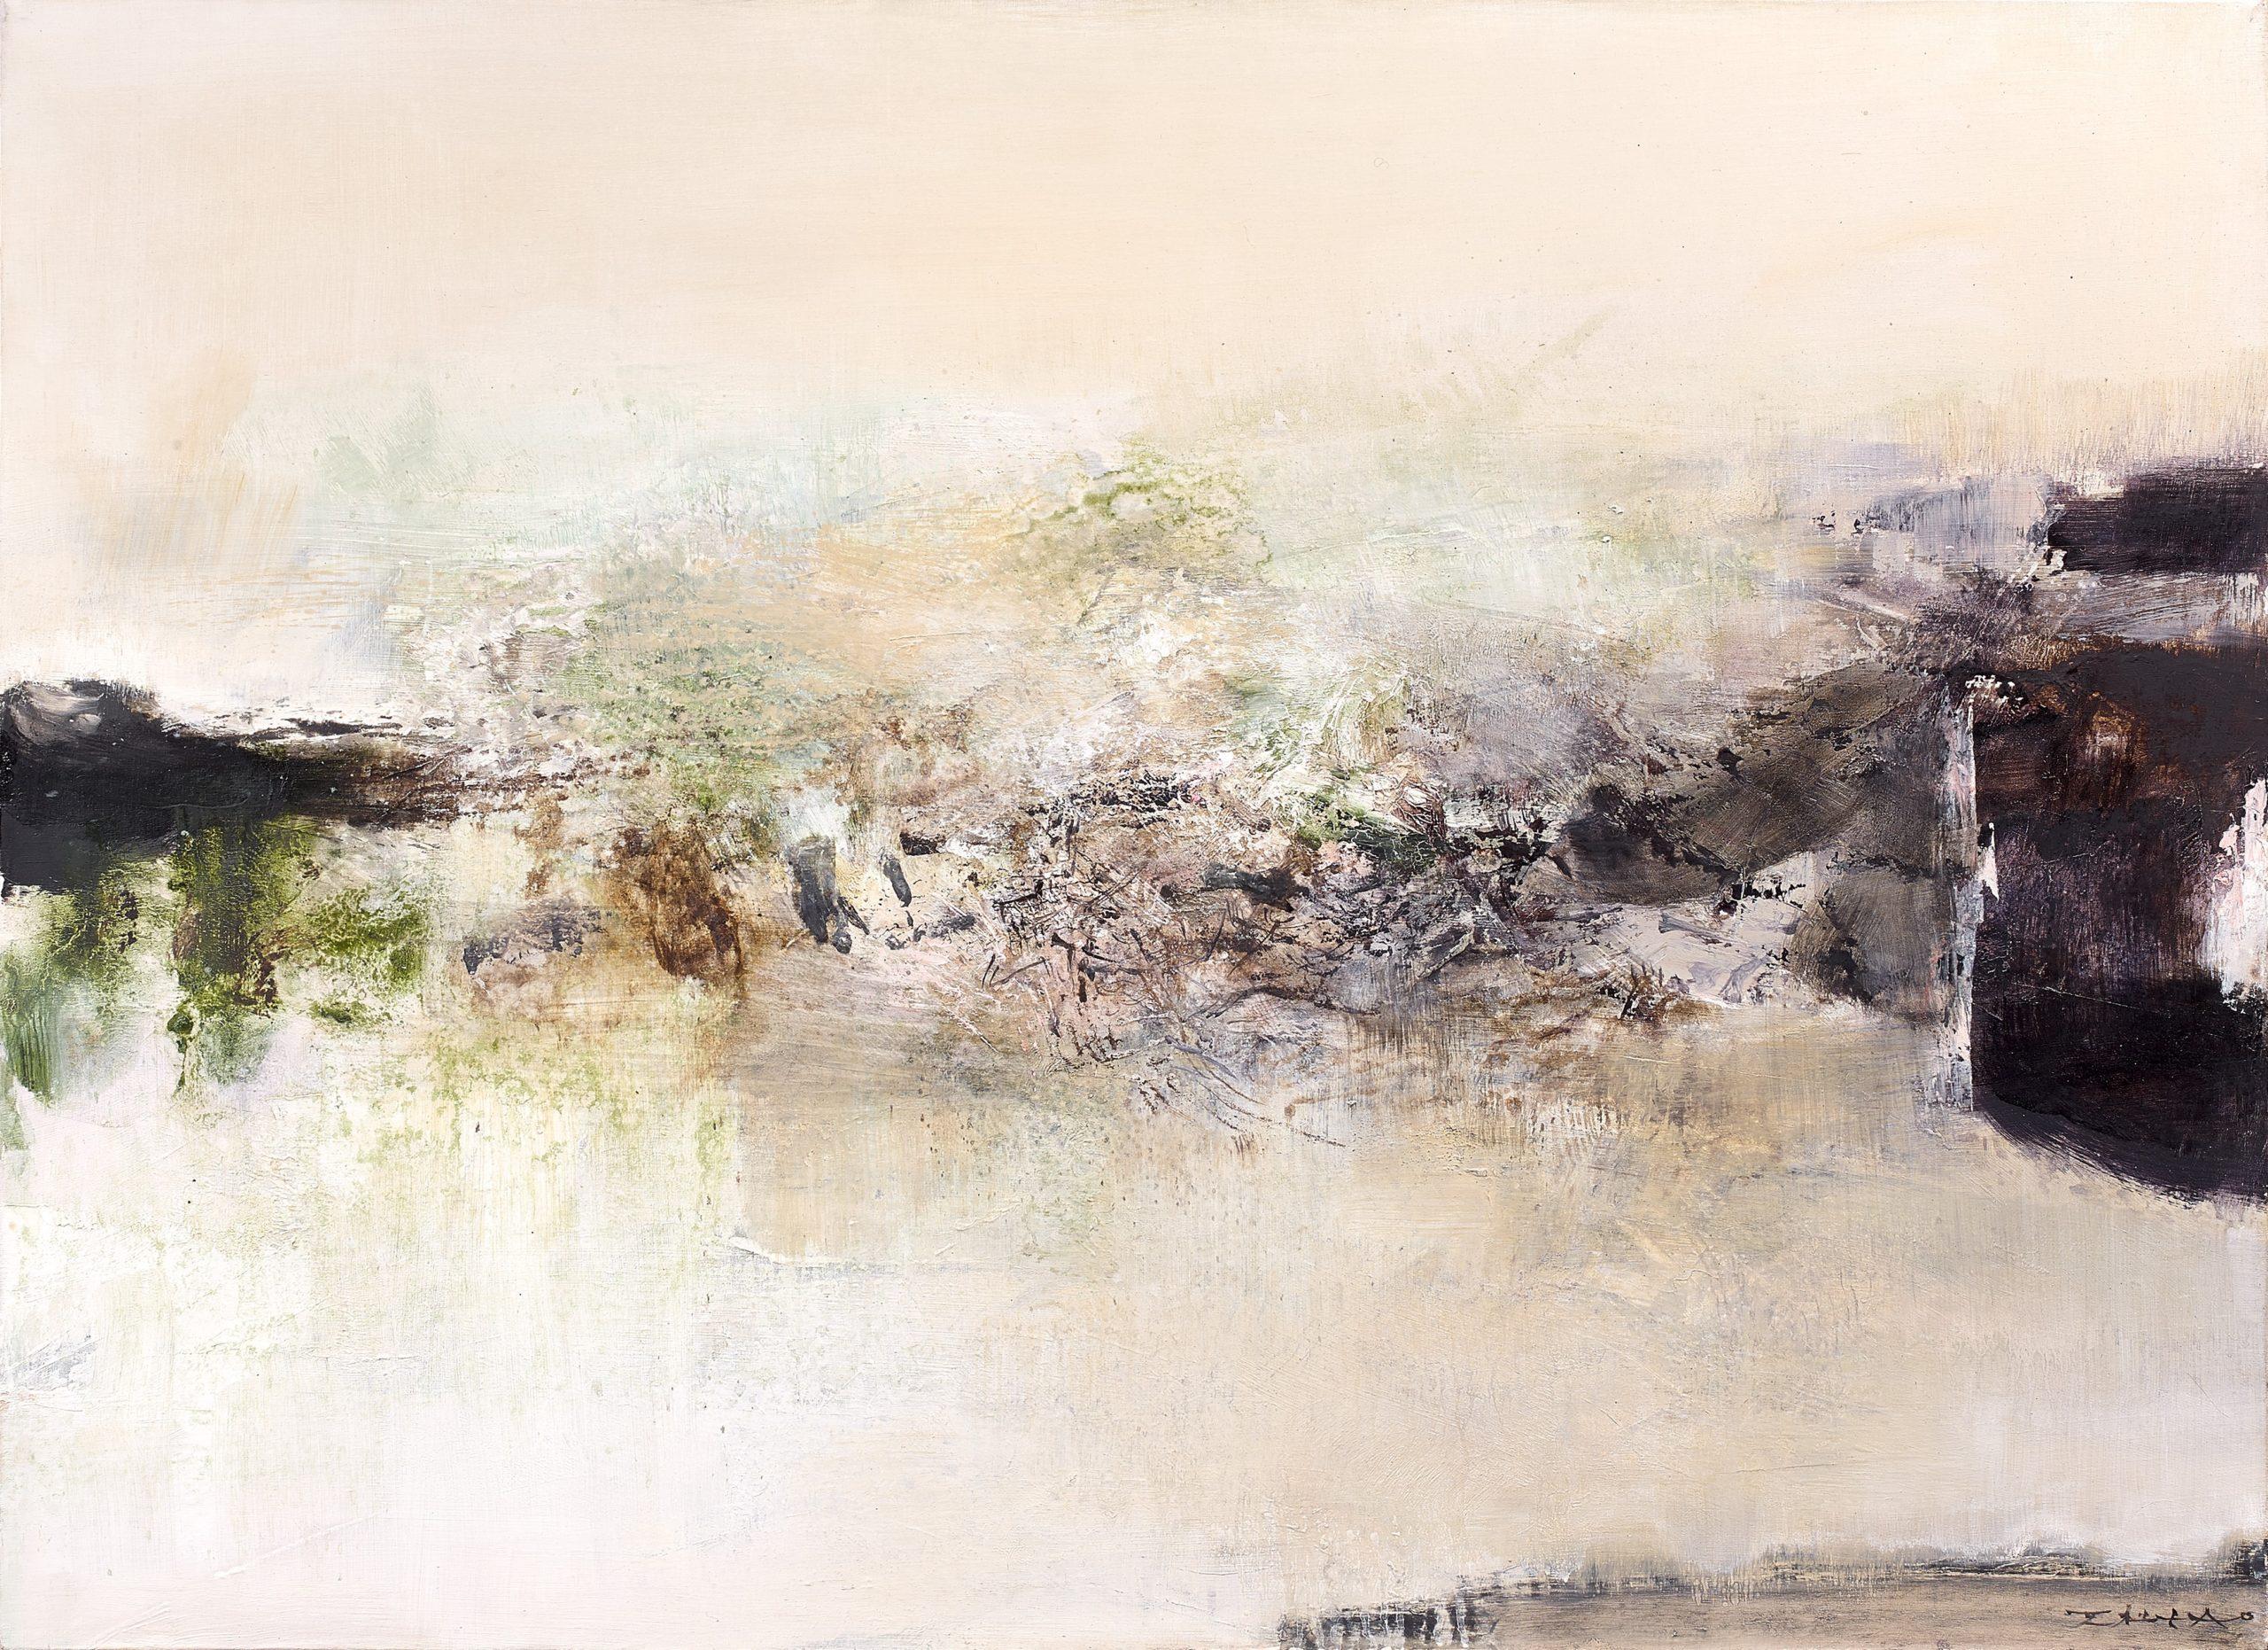 Zao Wou-Ki, 17.02.71-12.05.76, 1971-76 Huile sur toile 73 x 100 cm, courtesy galerie Mayoral